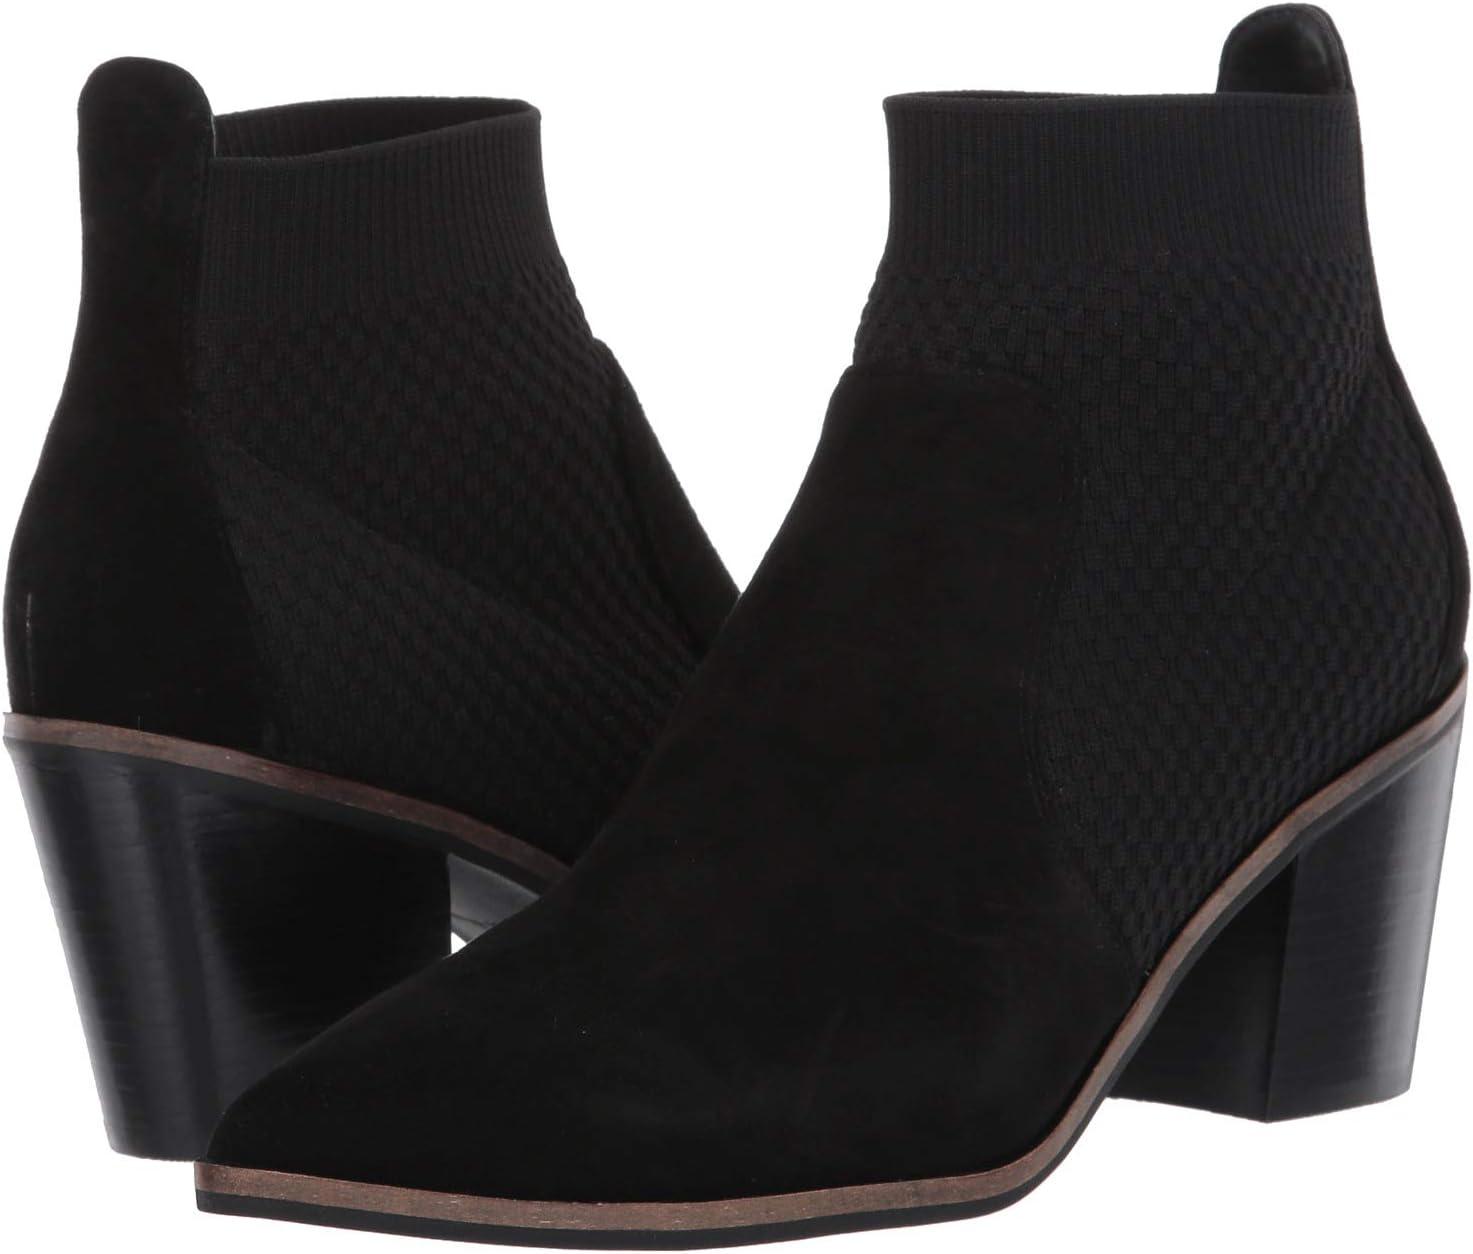 Cole Haan Maggie Bootie 75 mm | Women's shoes | 2020 Newest